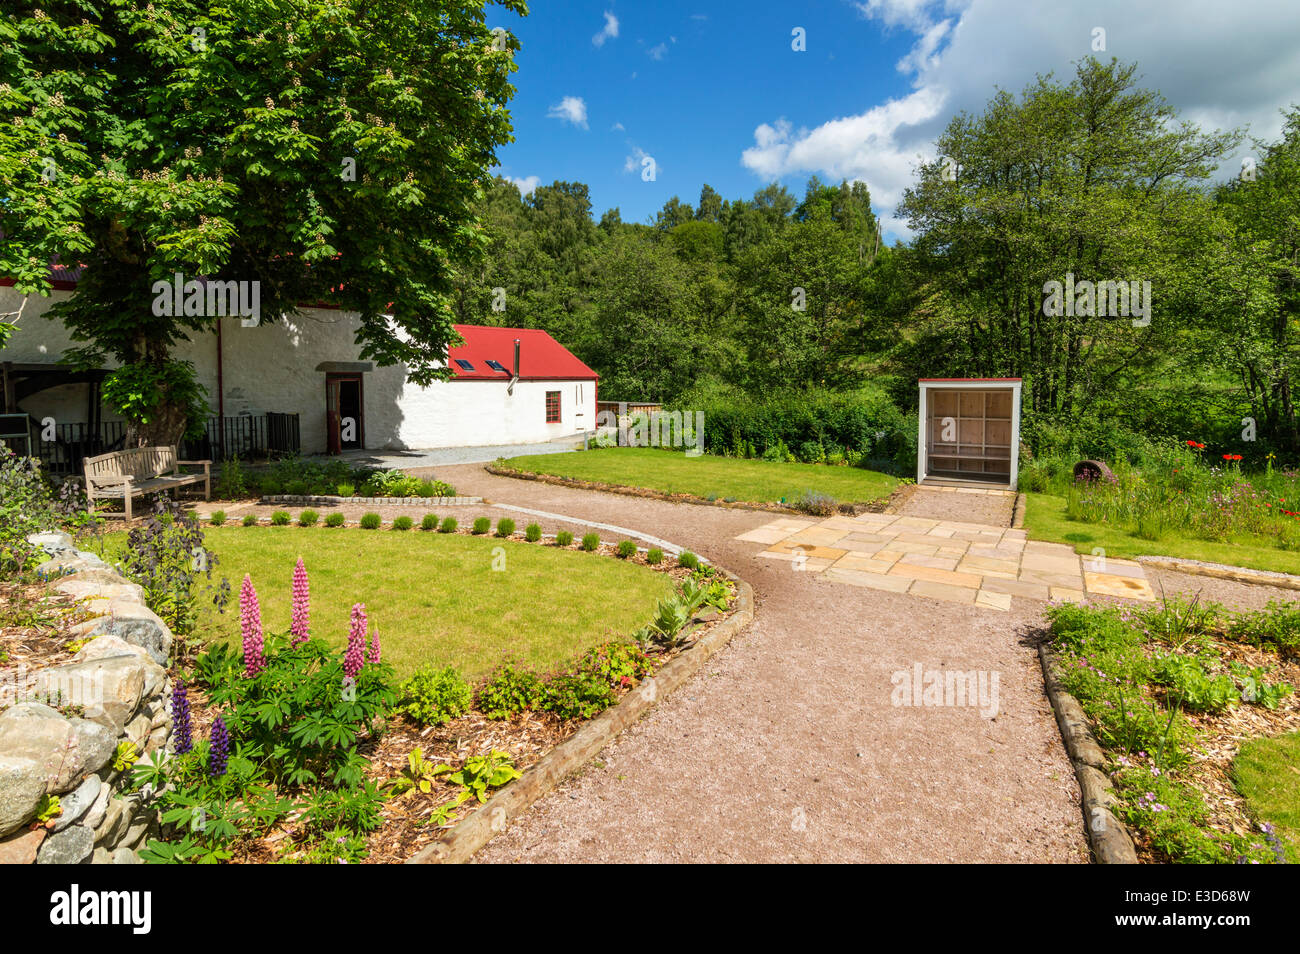 KNOCKANDO WOOL MILL THE SUMMER HOUSE AND GARDENS MORAY SCOTLAND - Stock Image